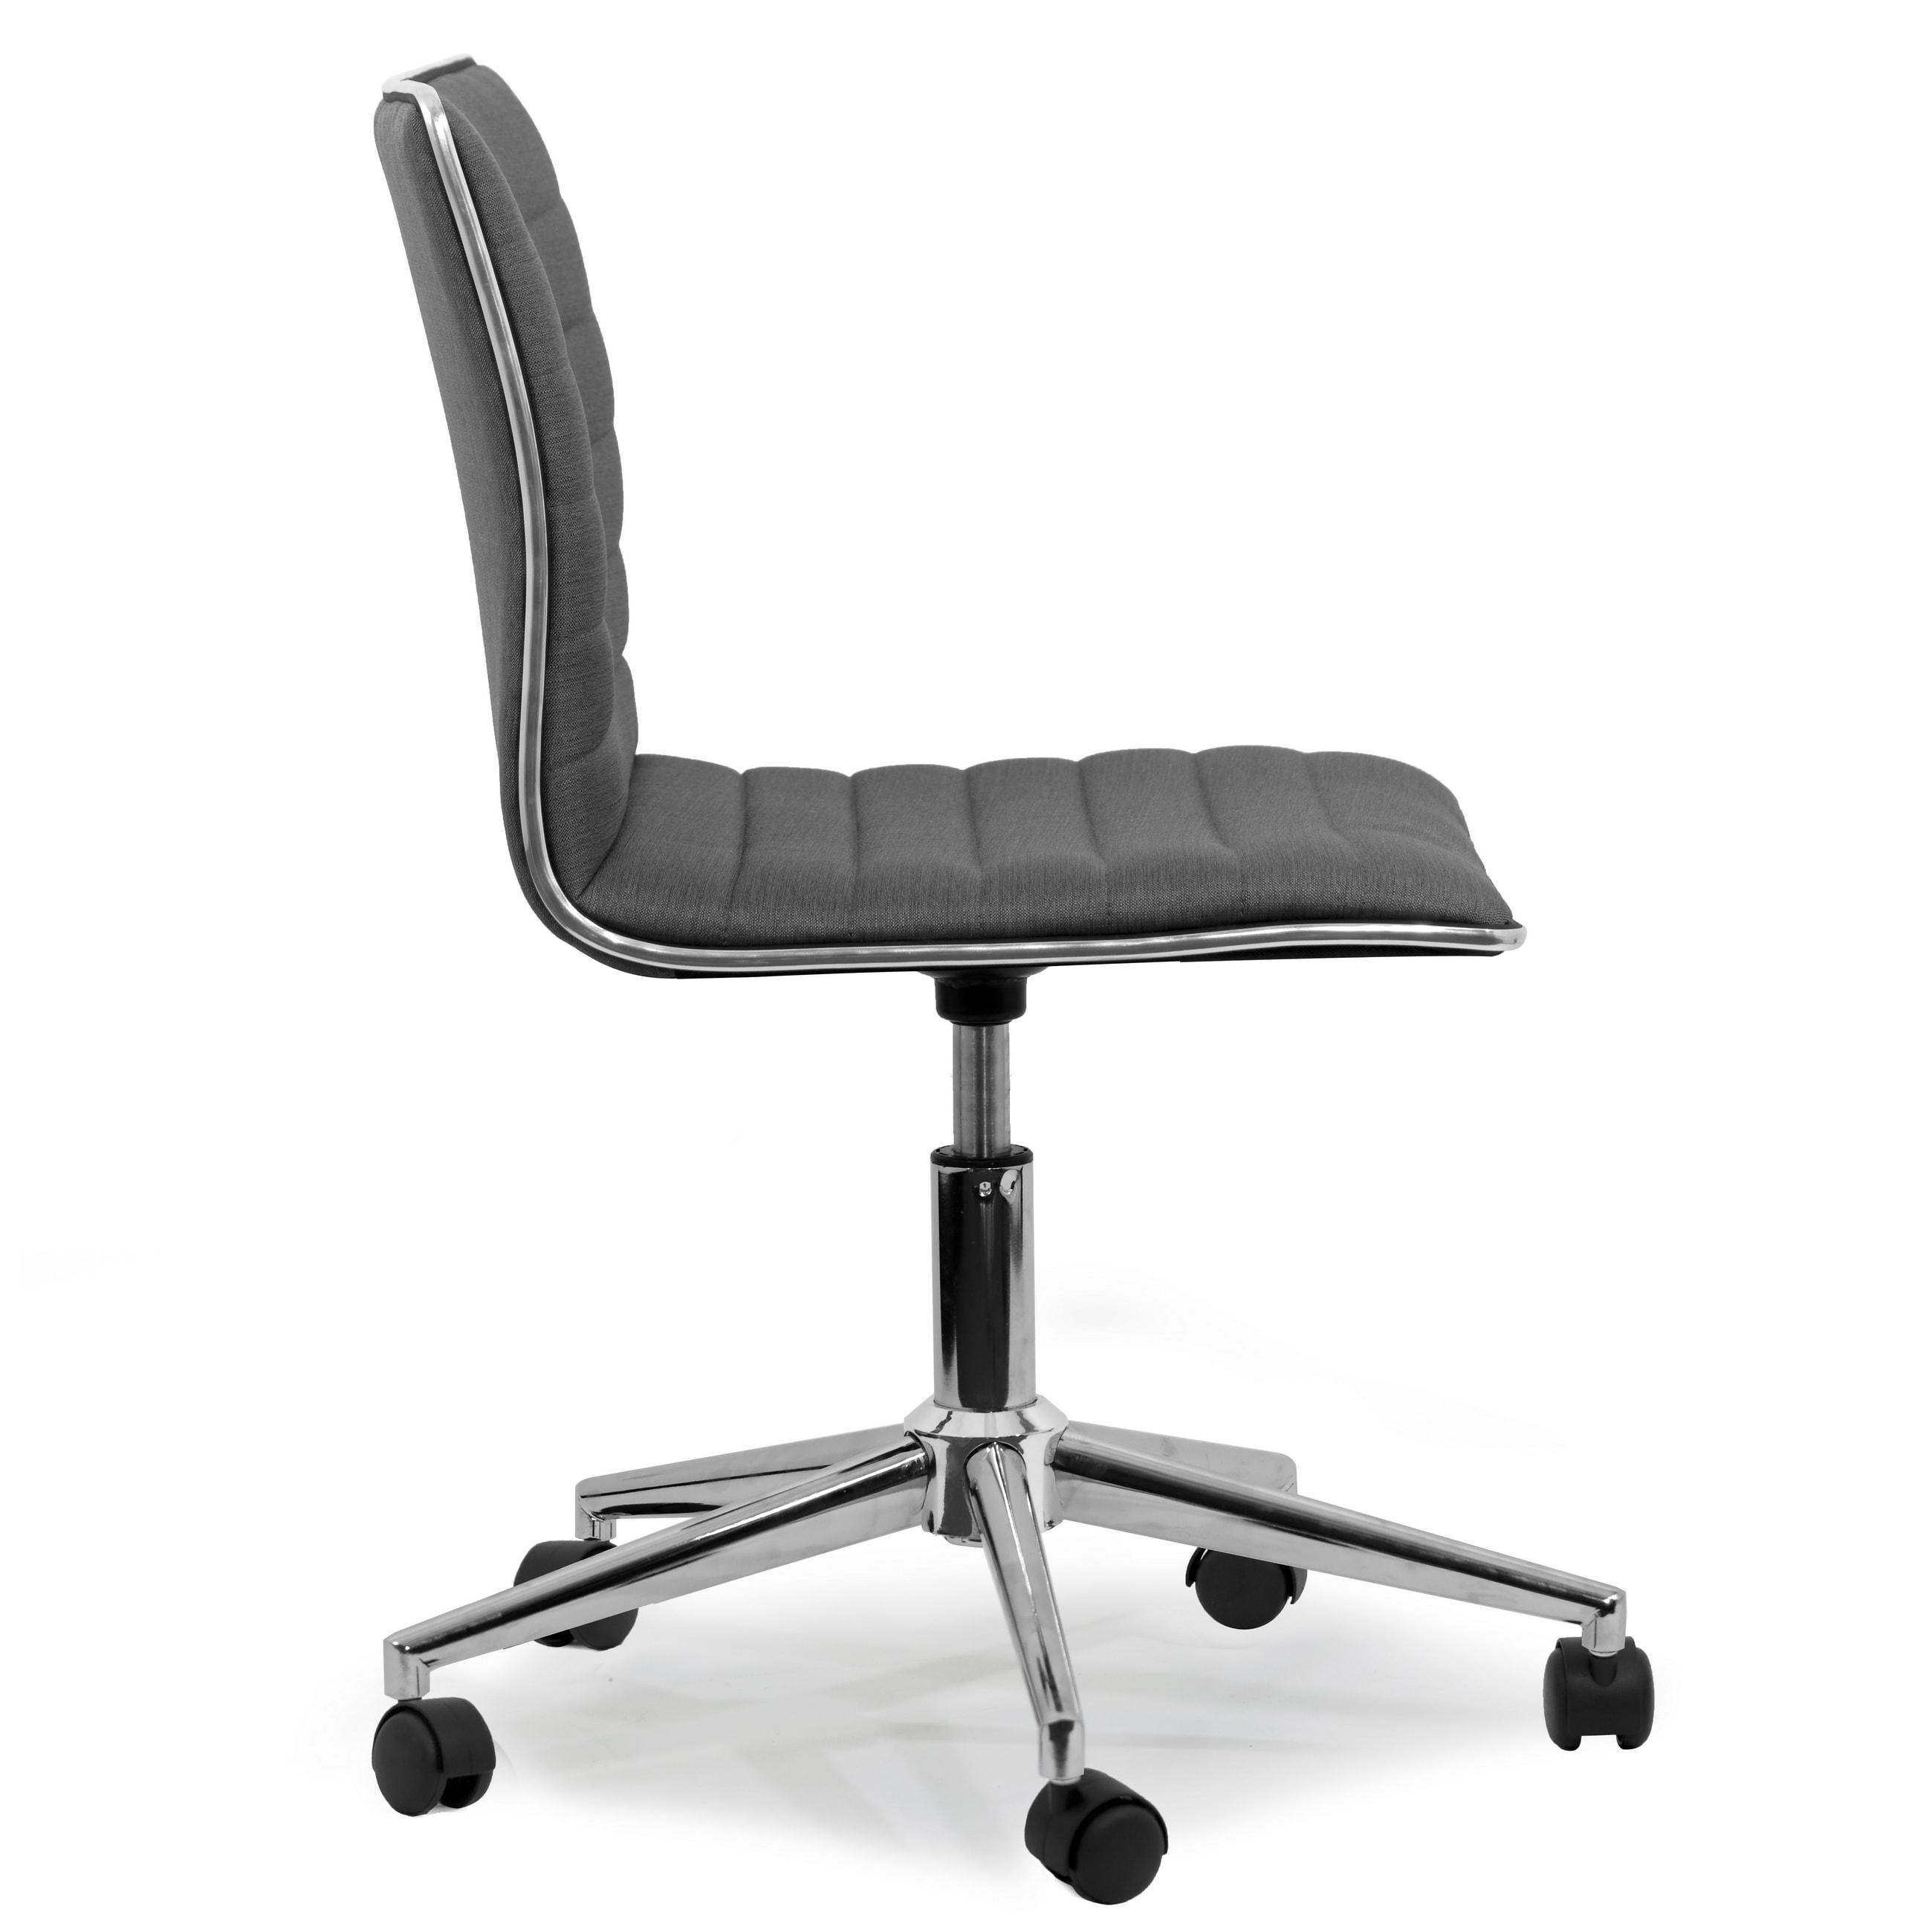 Chrome Metal Swivel Office Chair